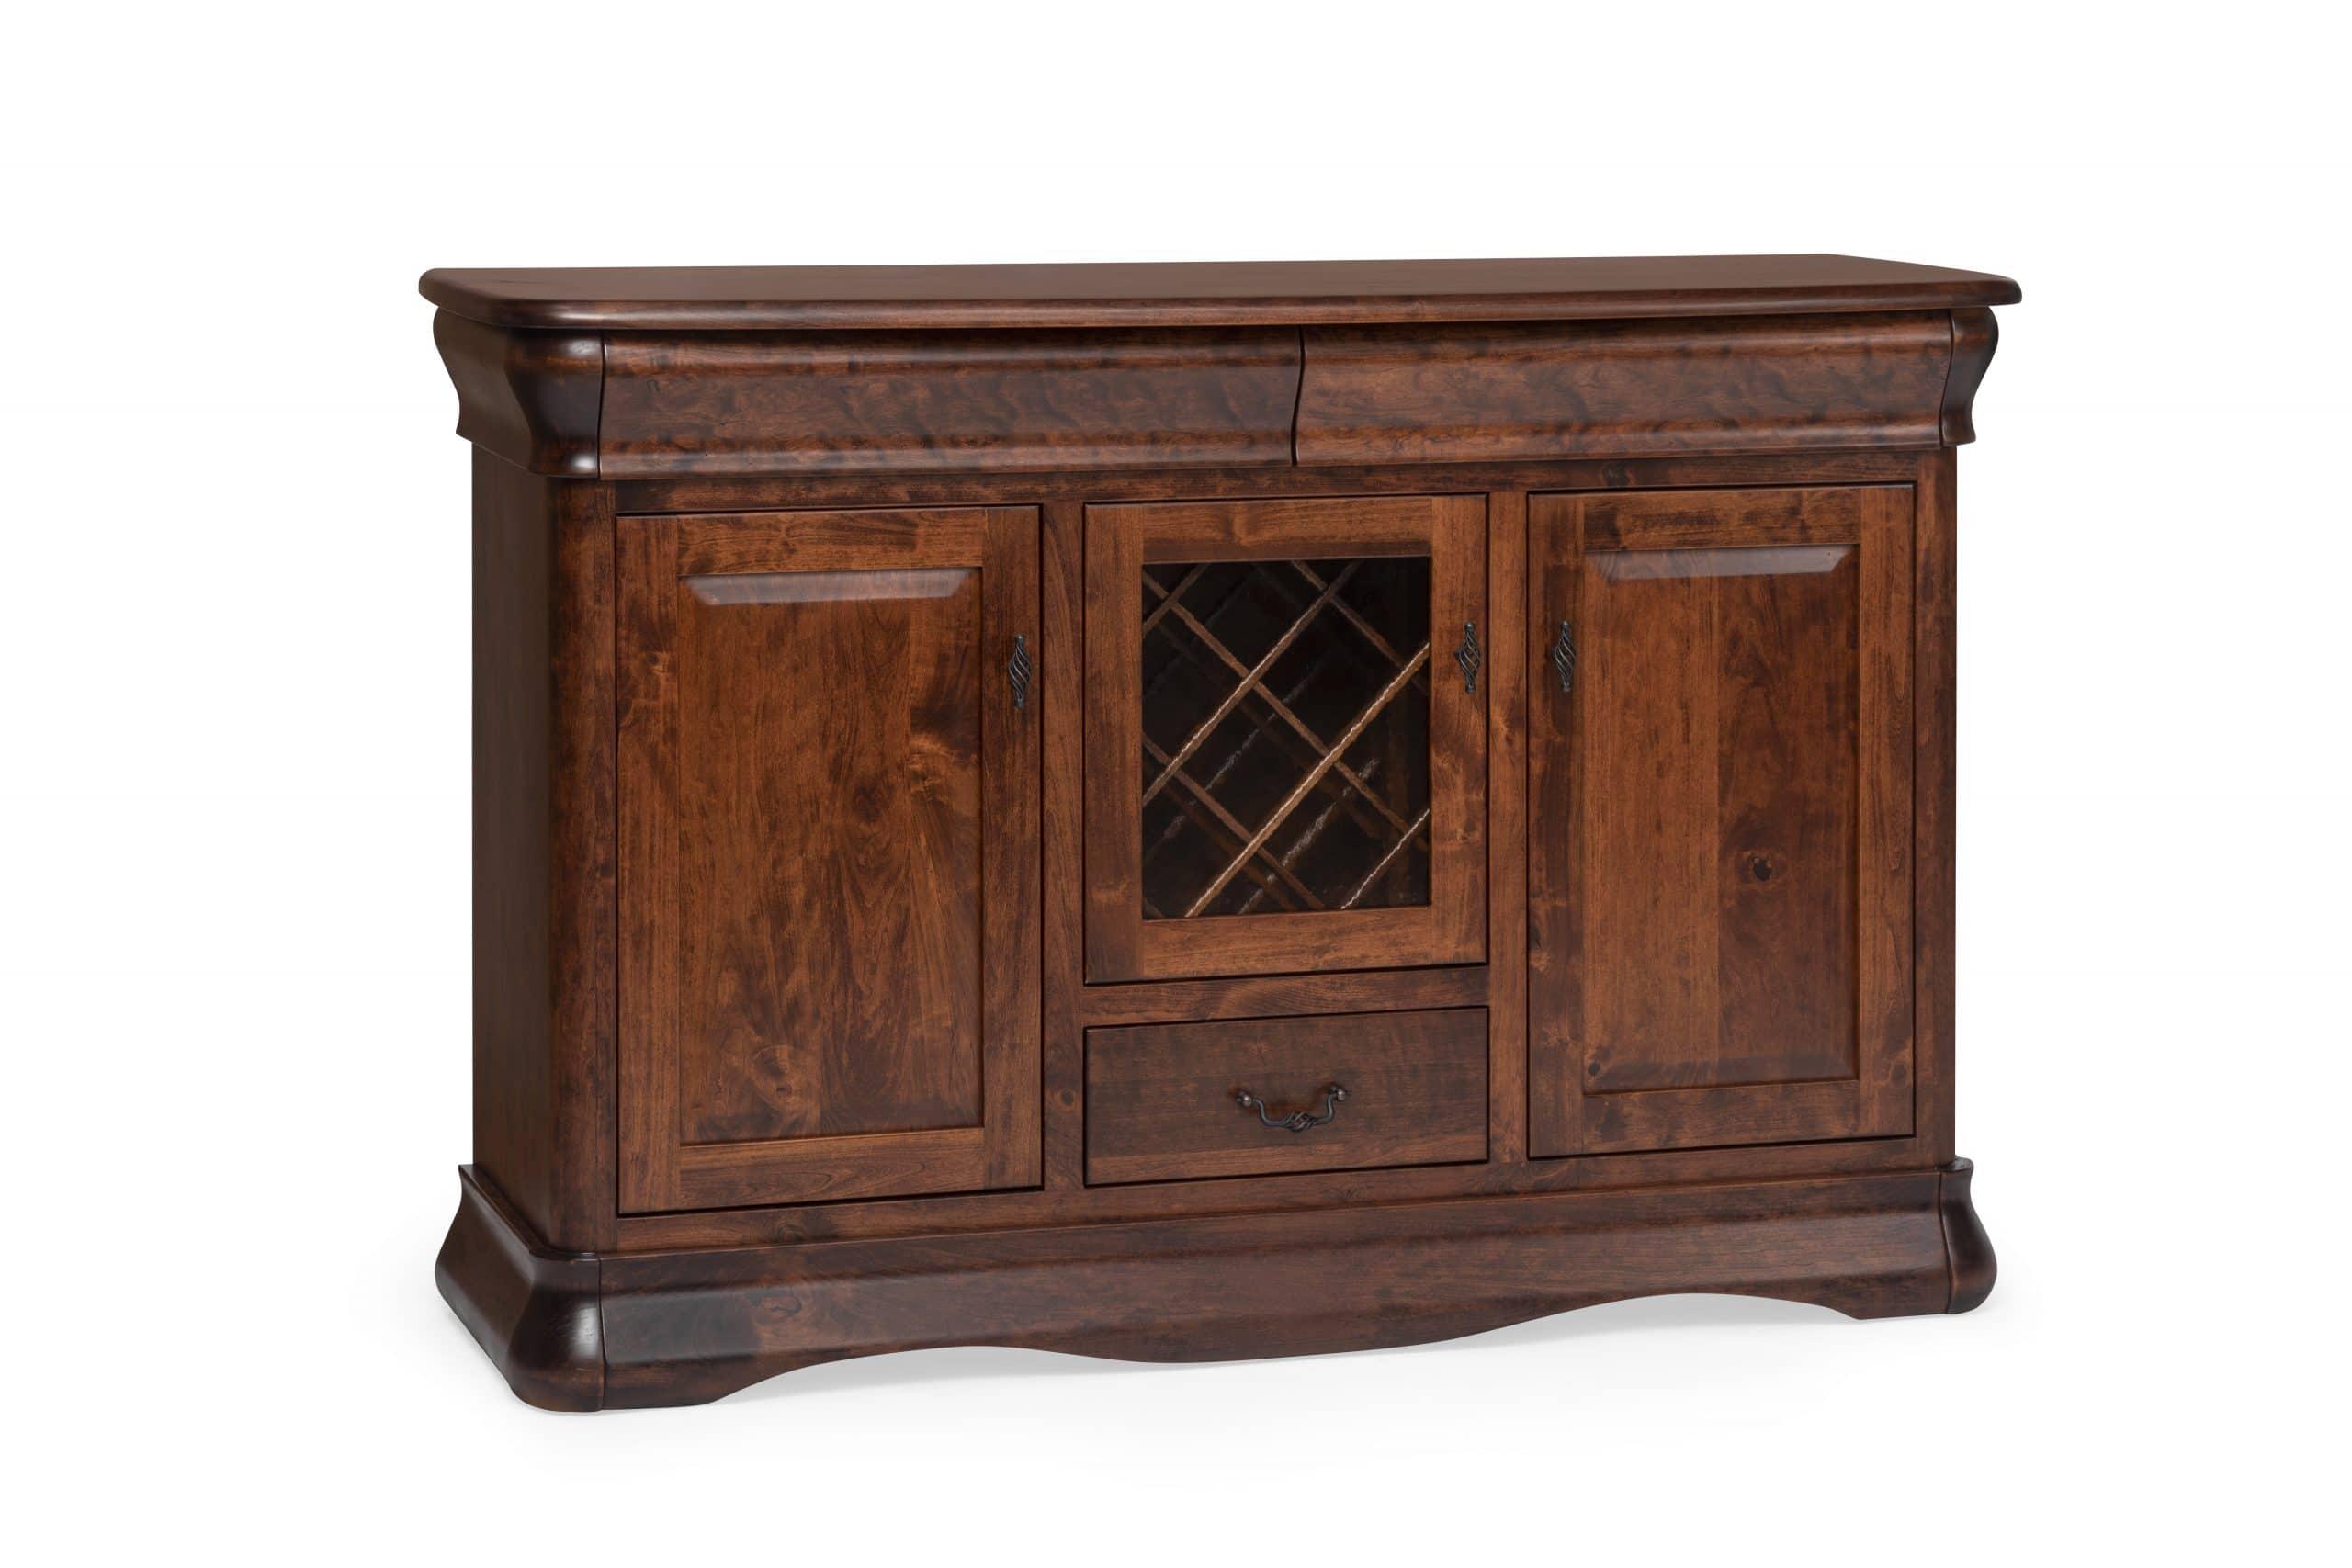 Dining Room: Storage & Display Cabinets